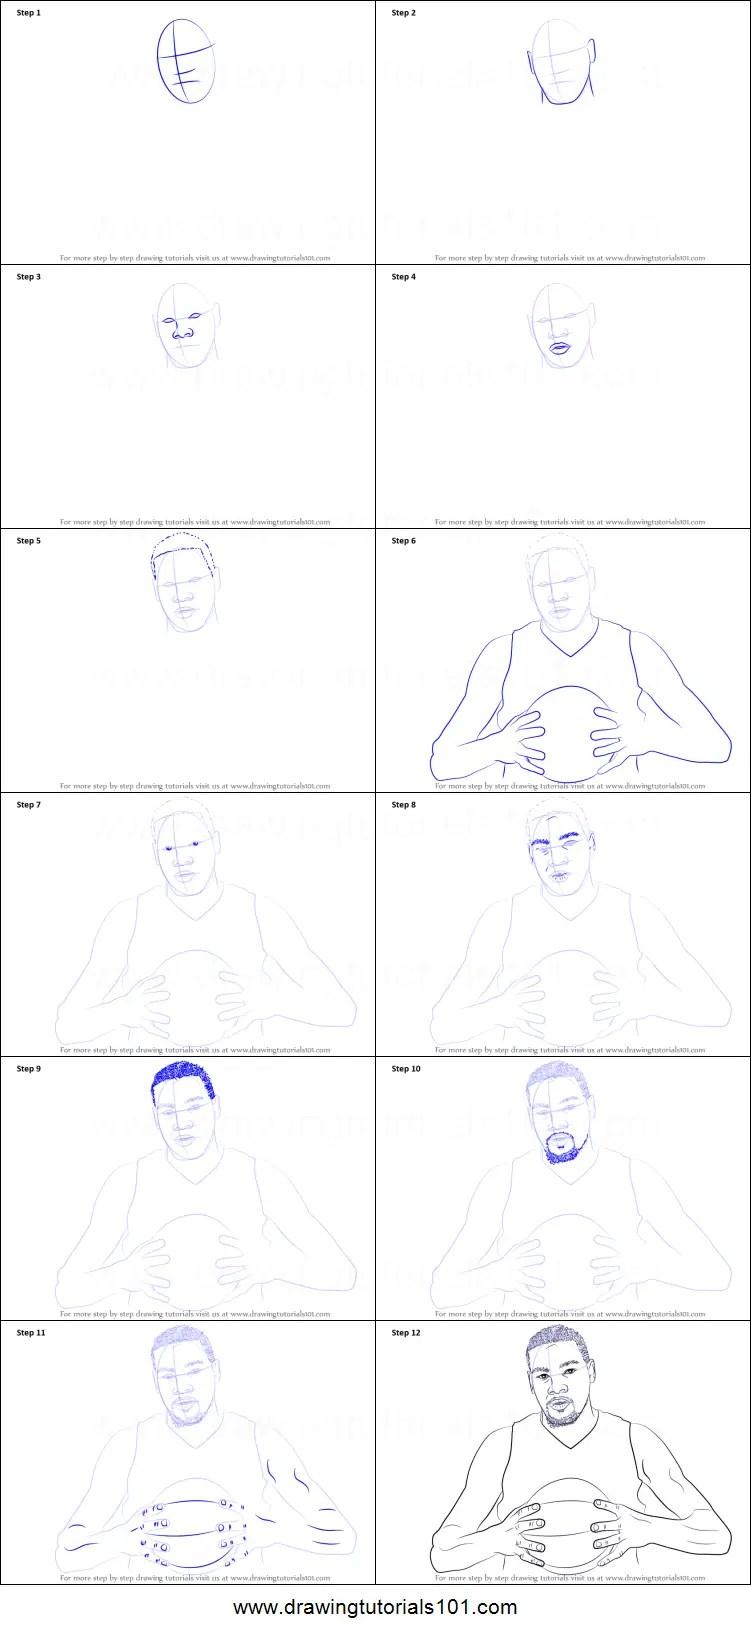 How To Draw Kevin Durant : kevin, durant, Kevin, Durant, Printable, Drawing, Sheet, DrawingTutorials101.com